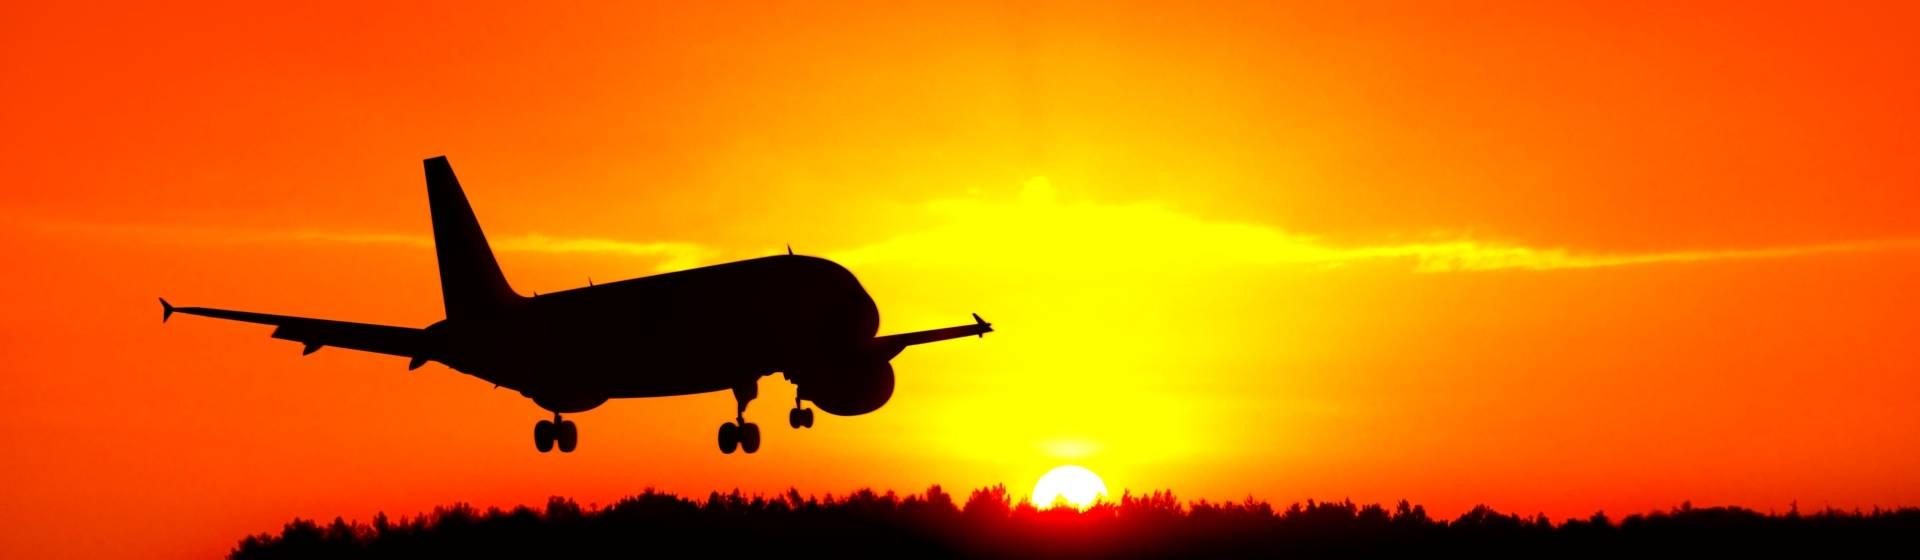 airplane-sunset